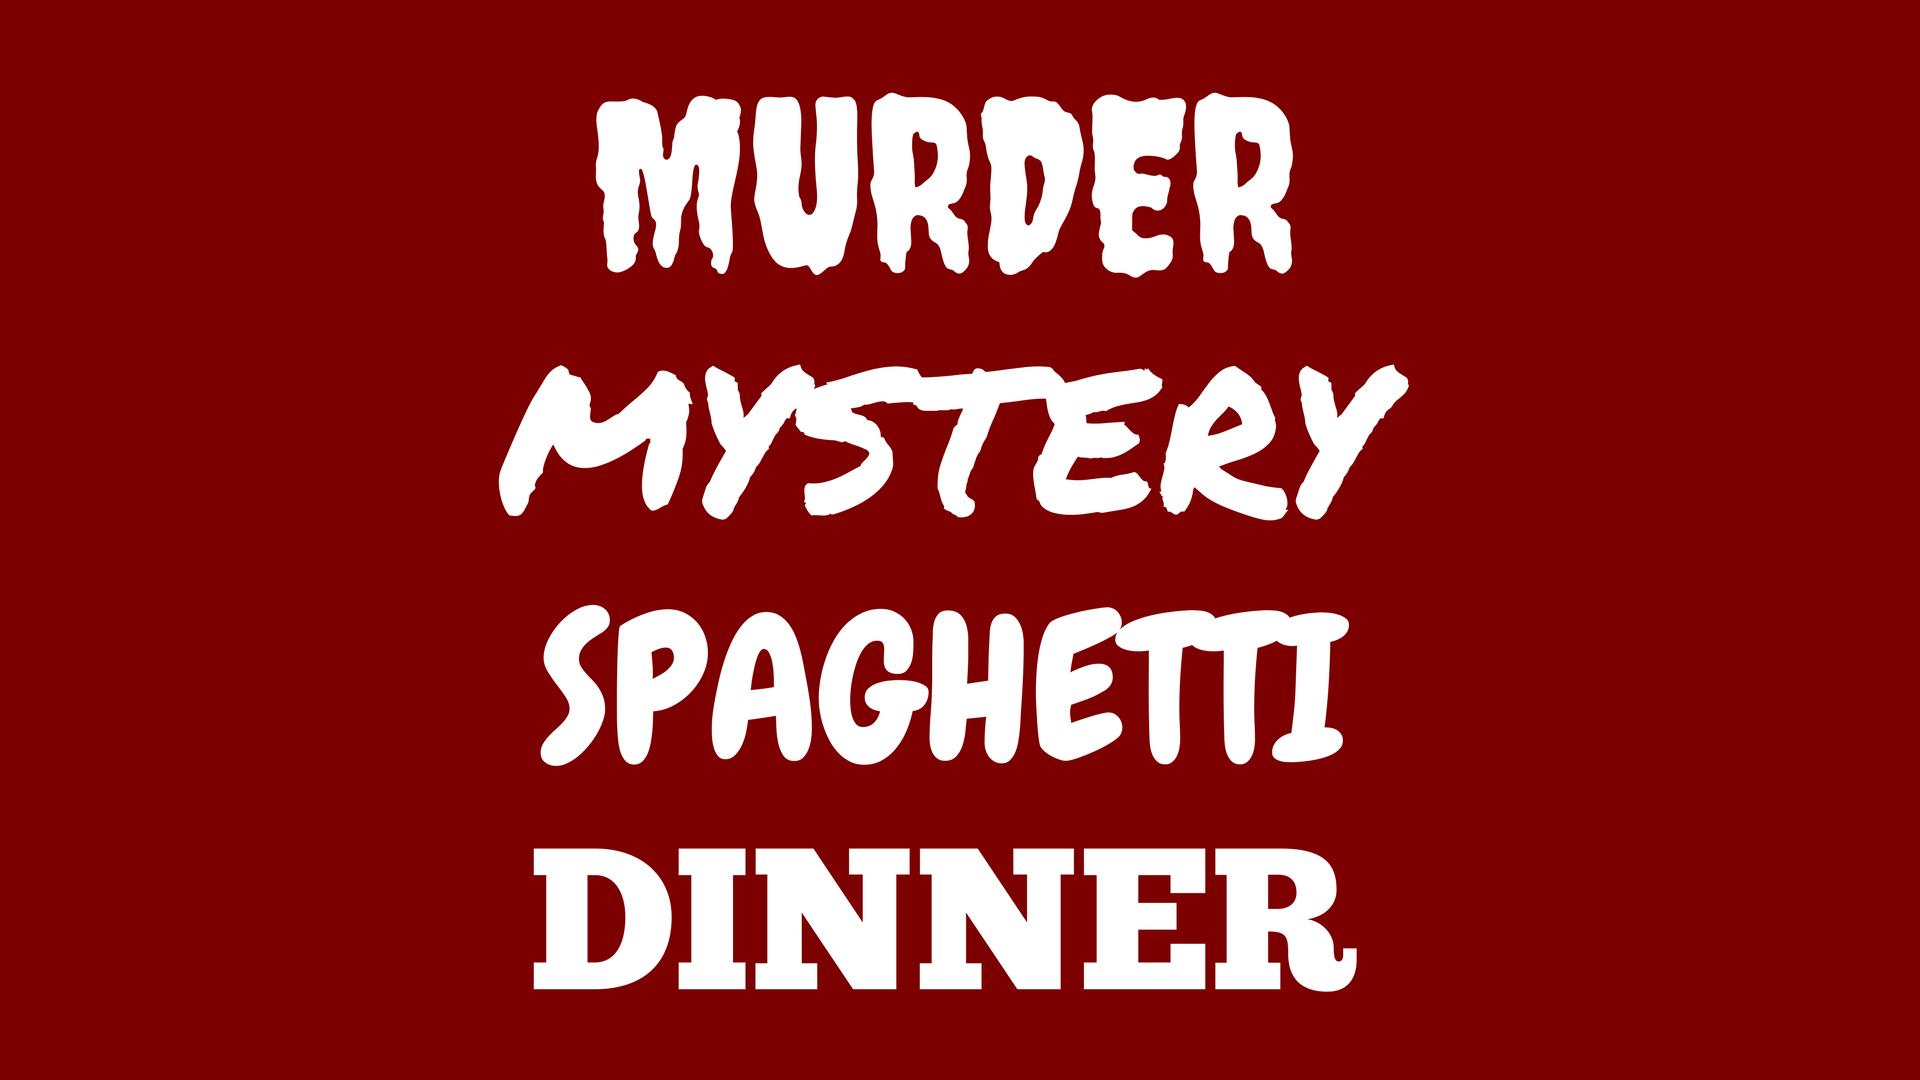 AppWideSpaghetti image